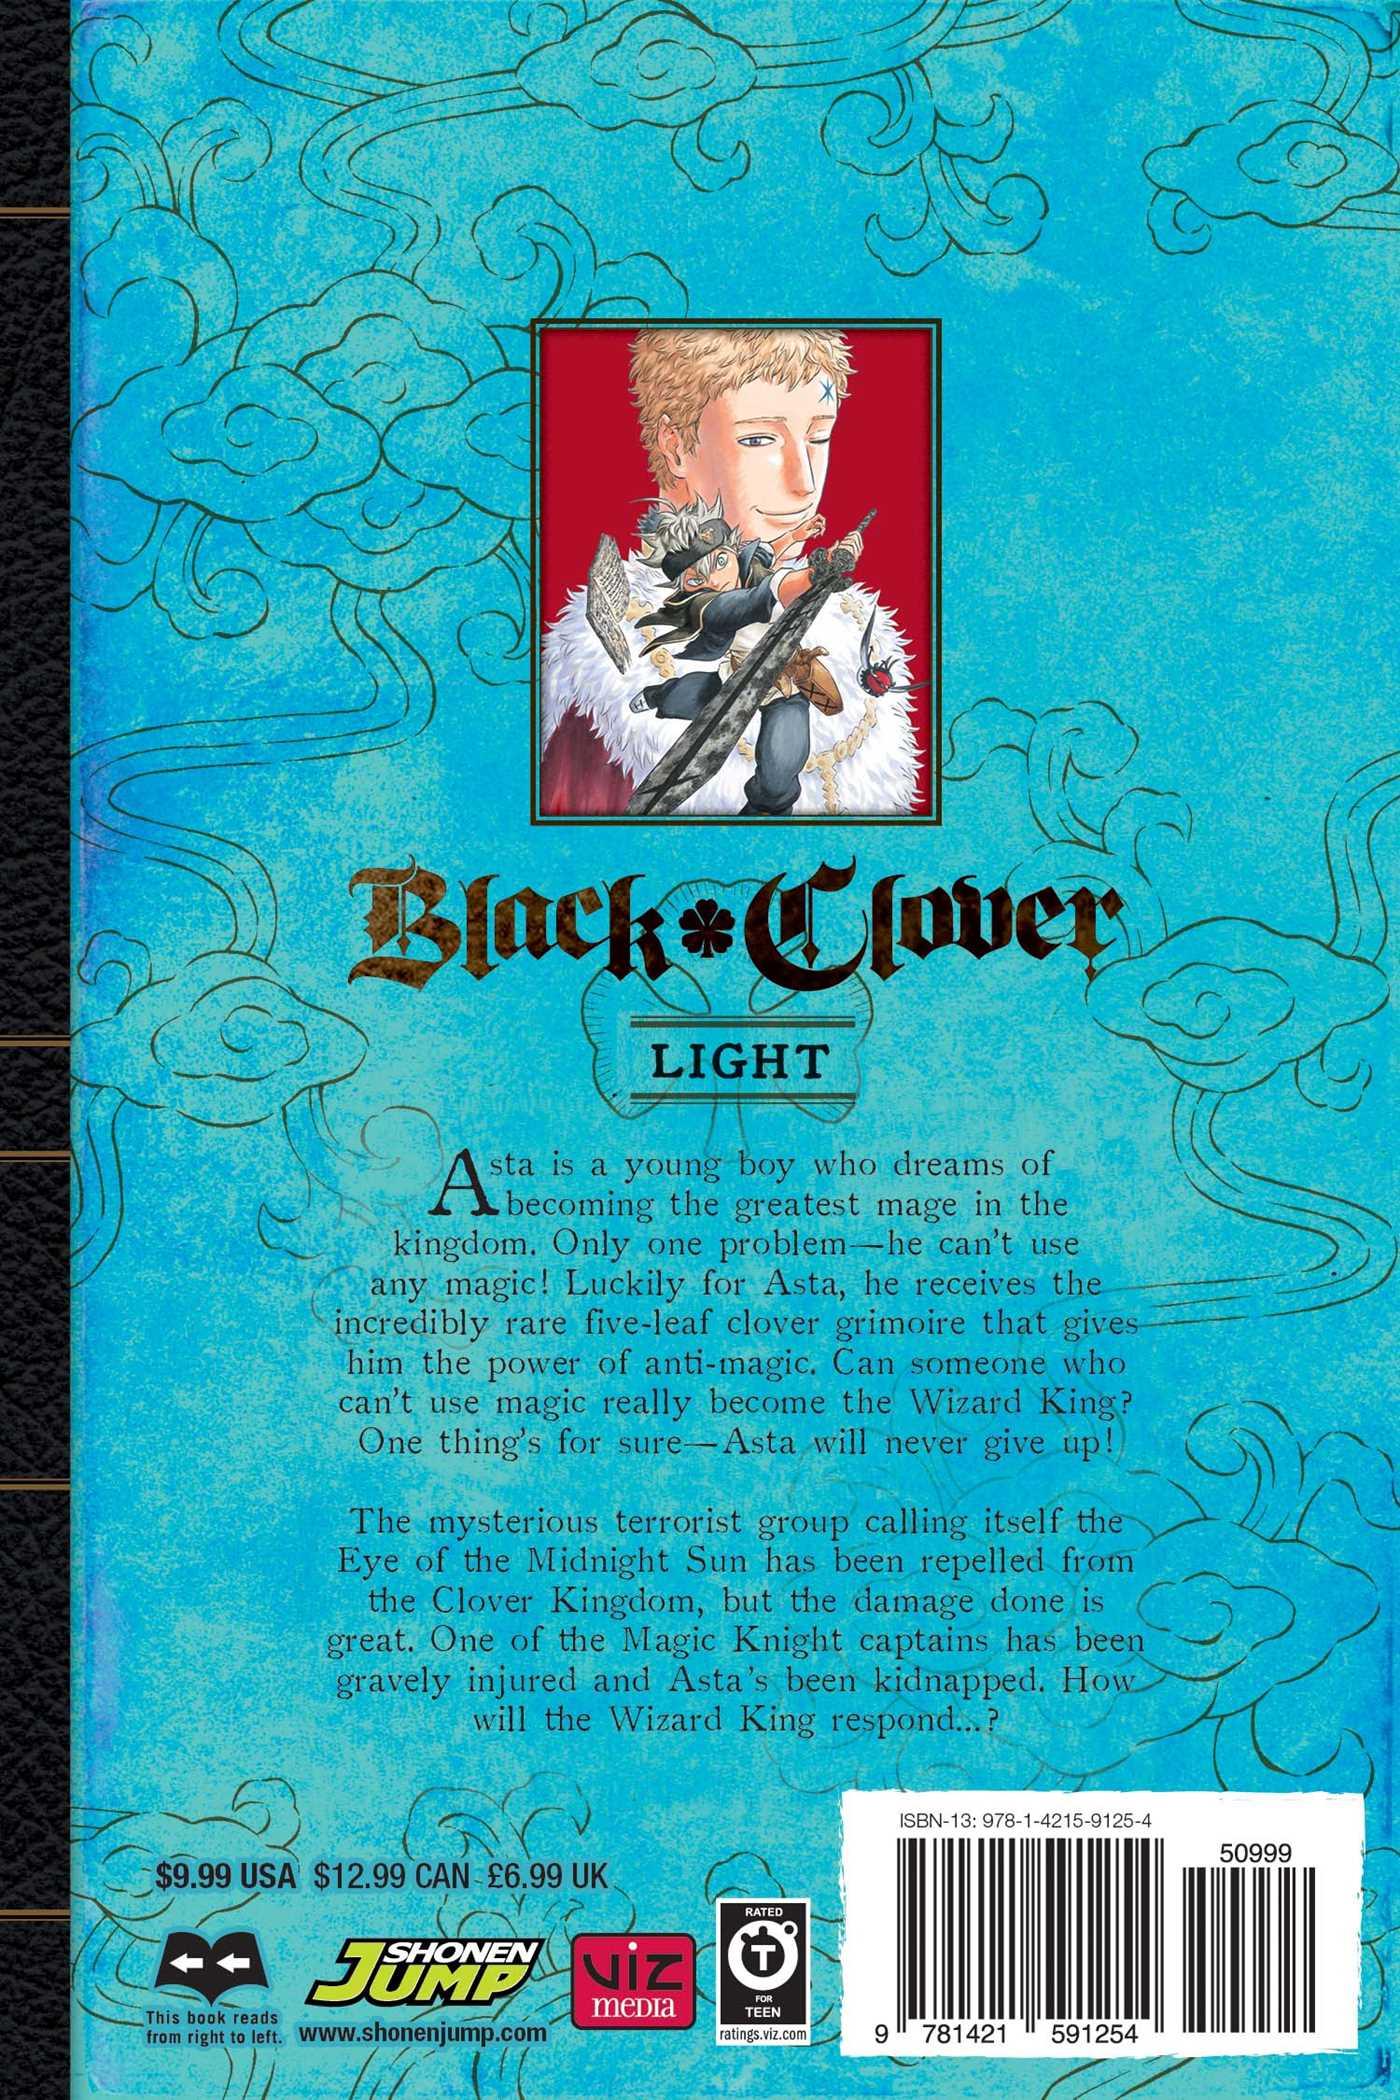 Black Clover, Vol. 5 | Book by Yuki Tabata | Official ...